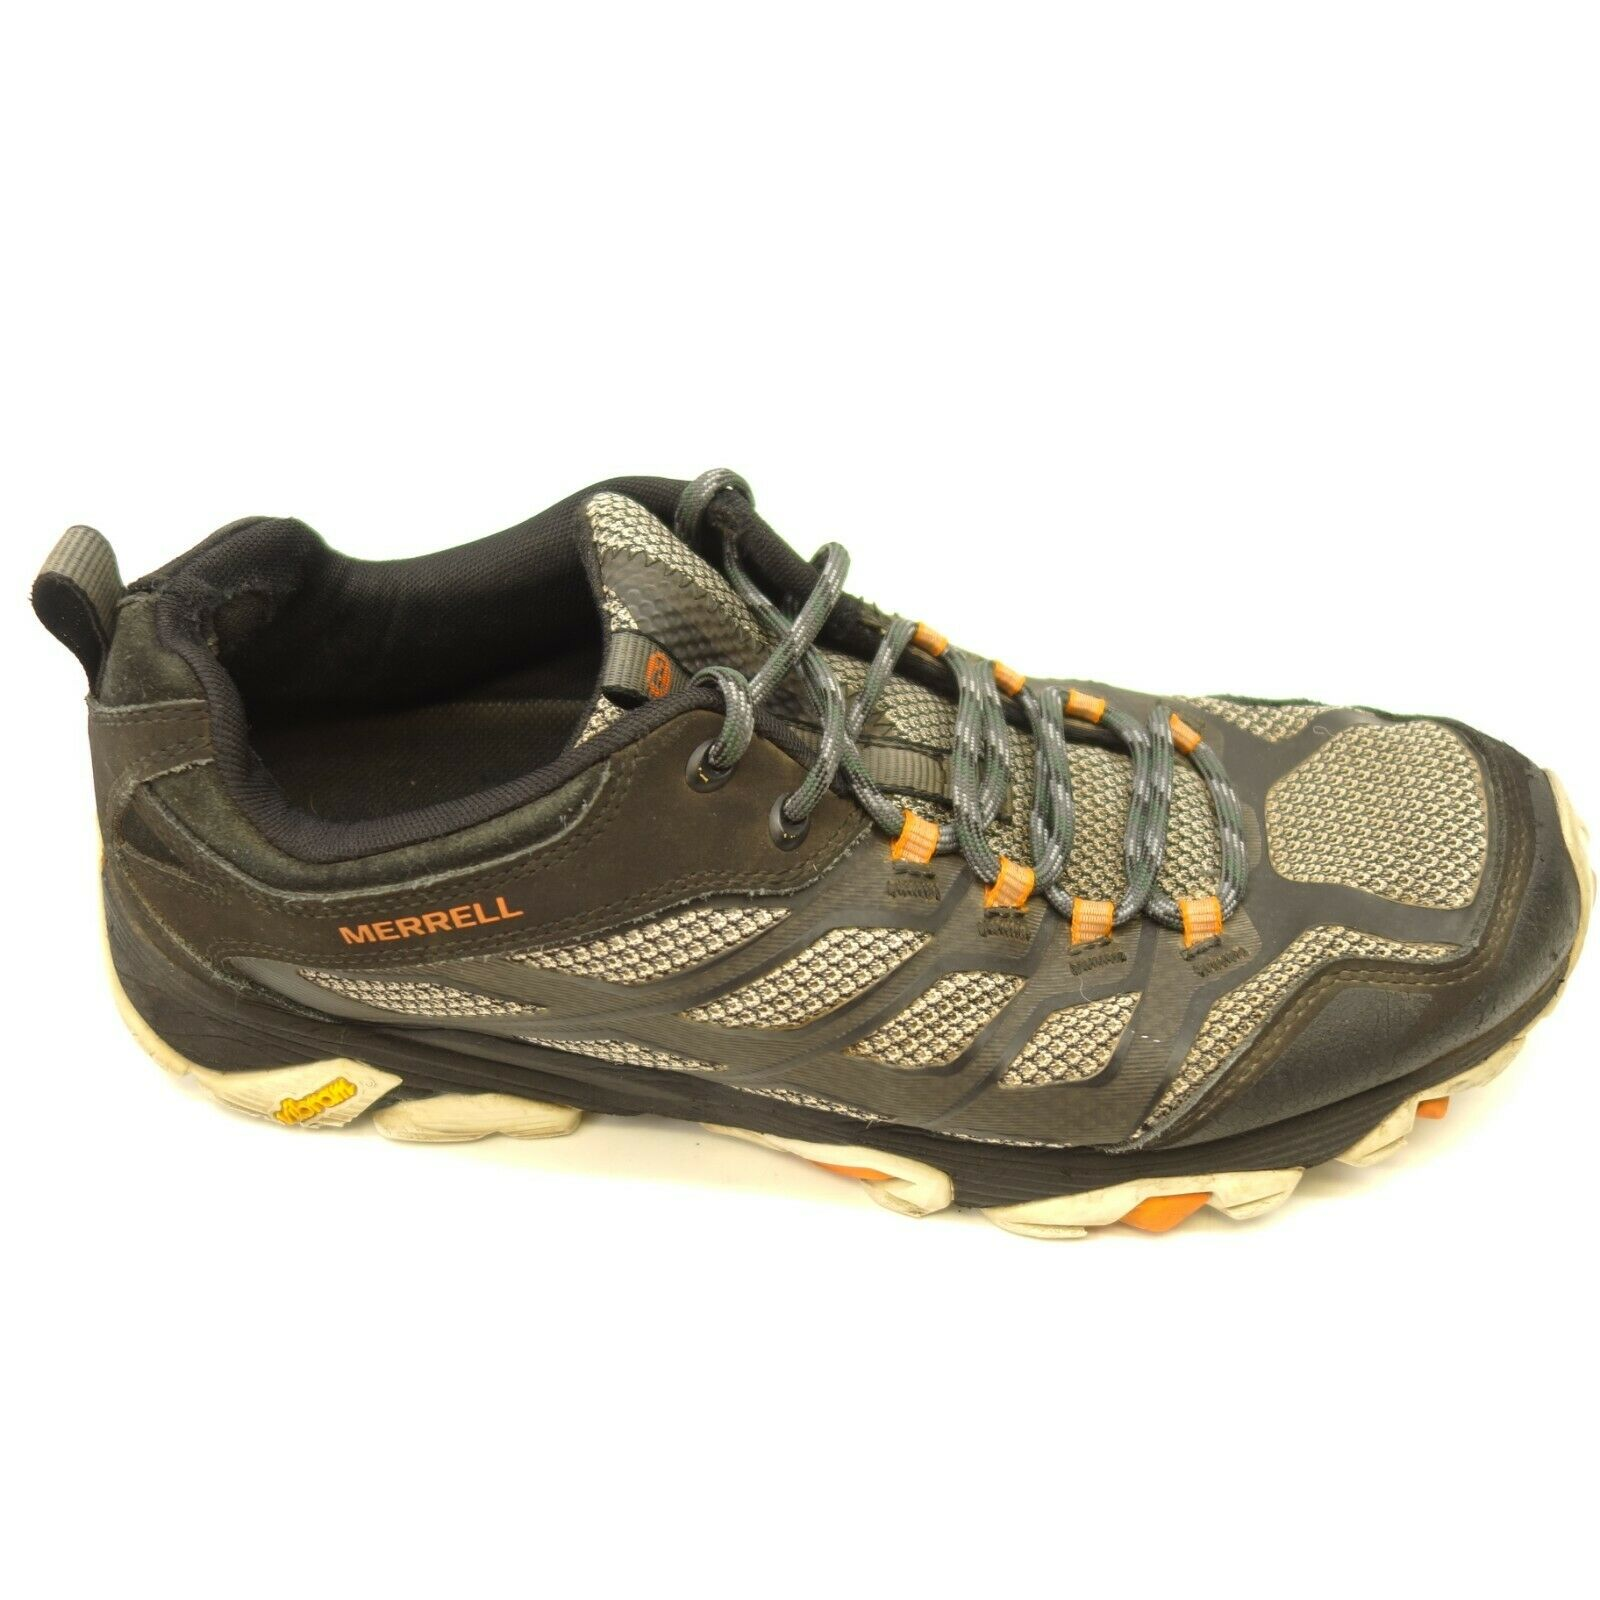 Merrell Moab FST bajo US 11 senderismo montaña trail para hombre Zapatos Atléticos